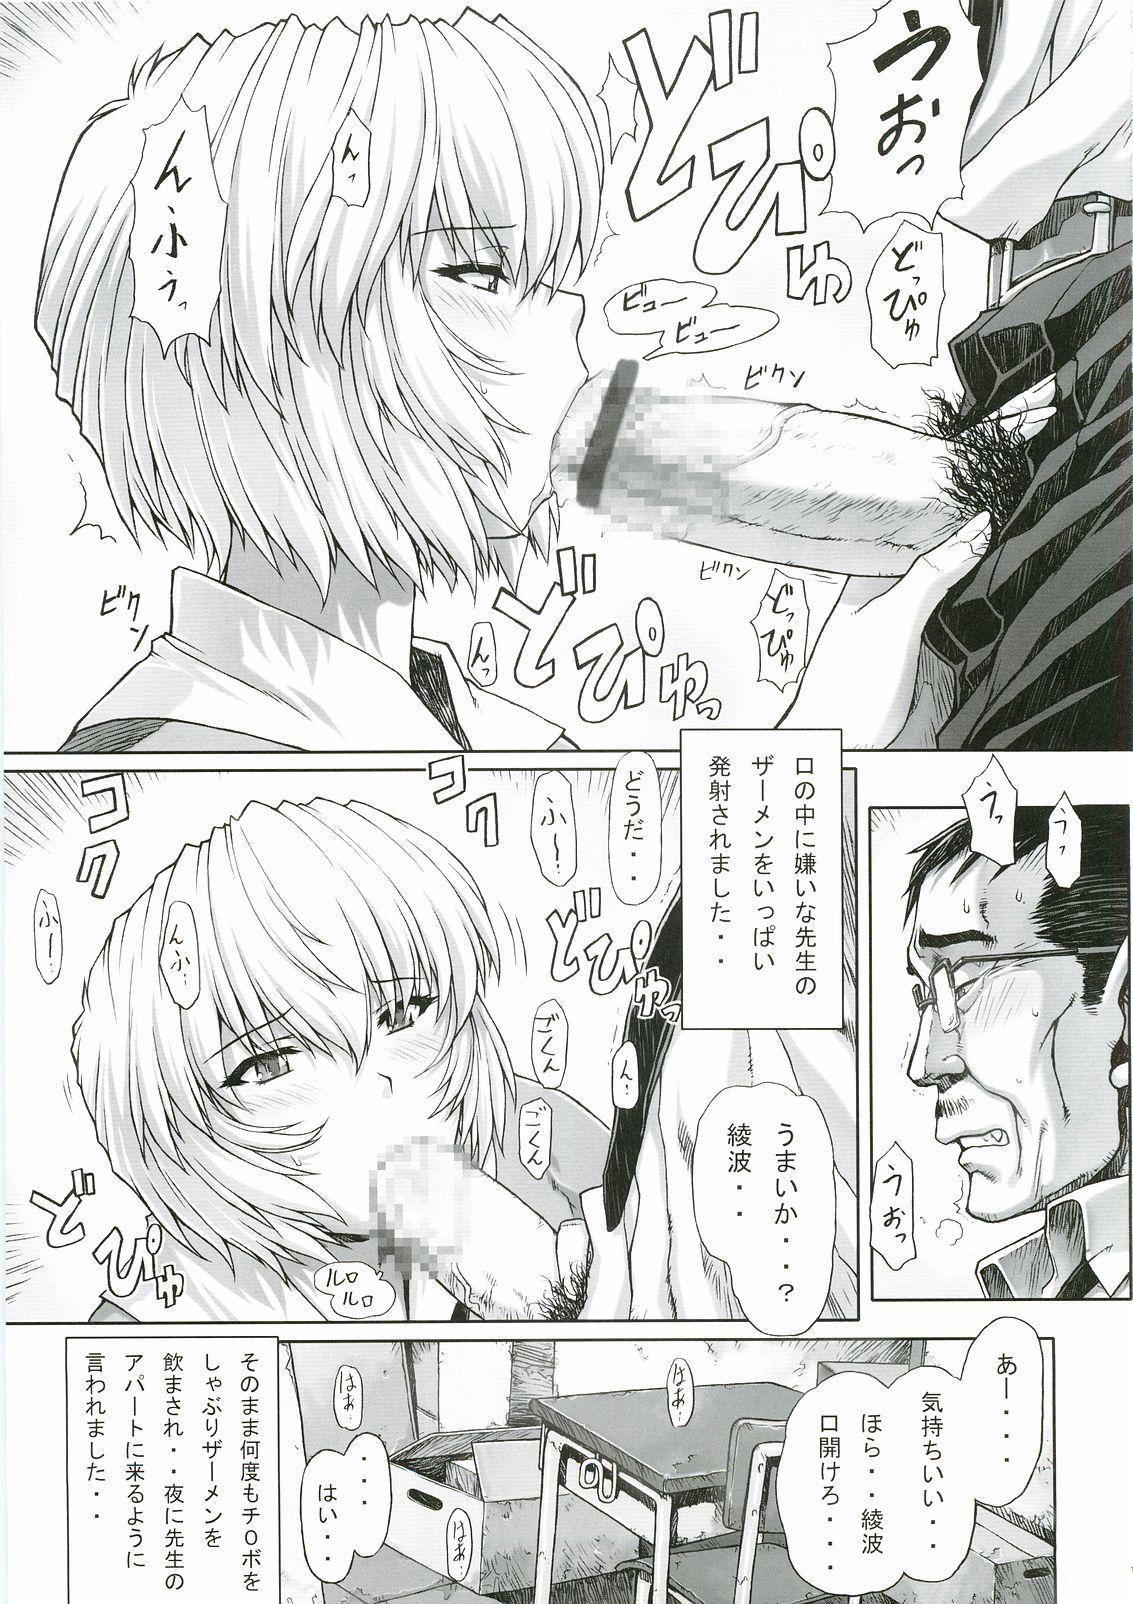 Ayanami Rei 00 13